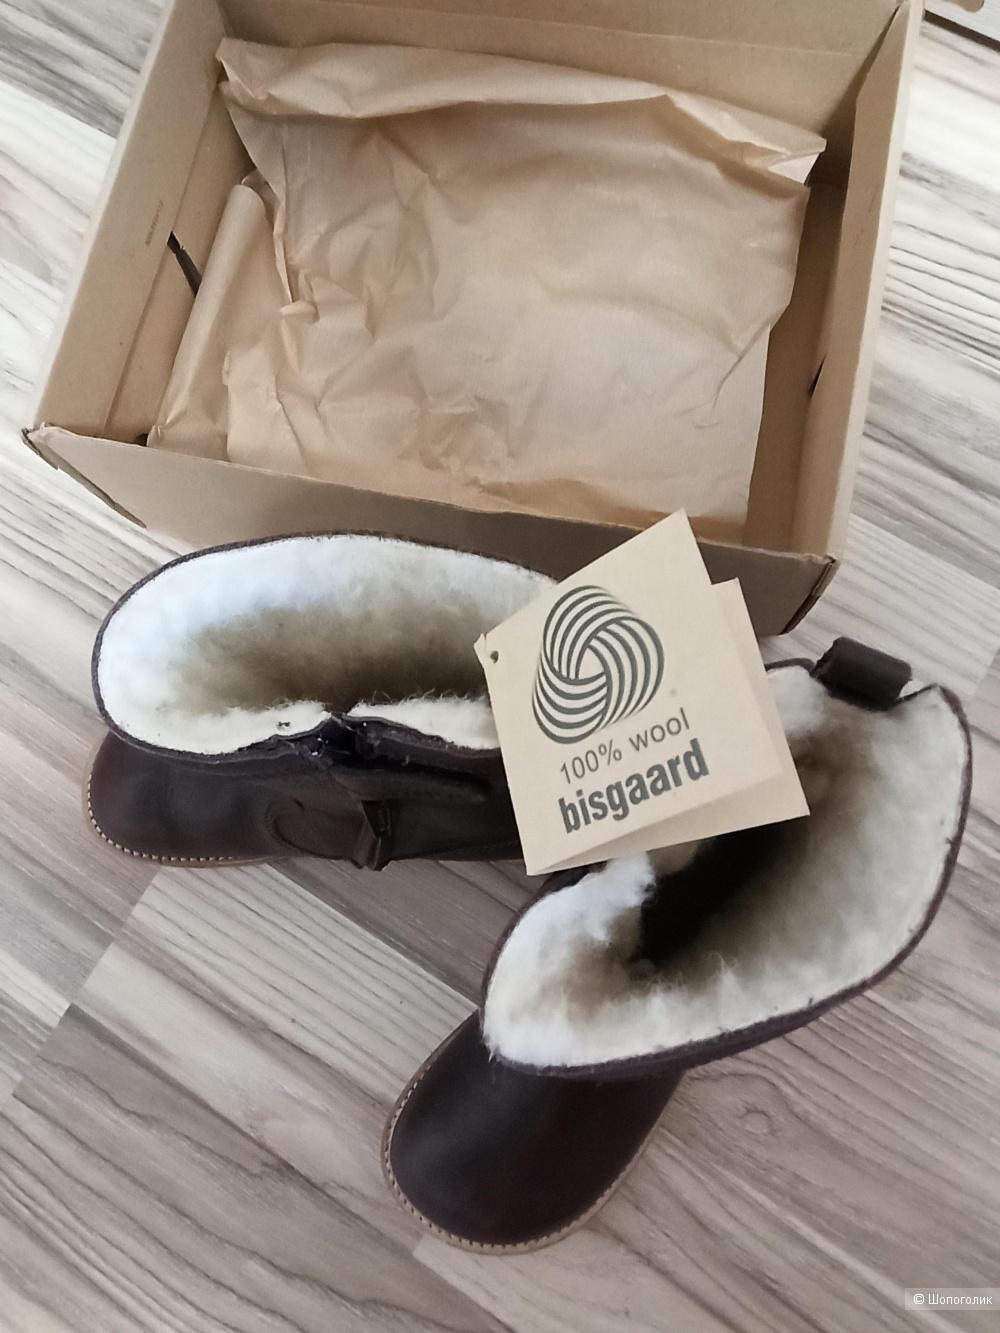 Сапожки  Bisgaard, размер 33/34